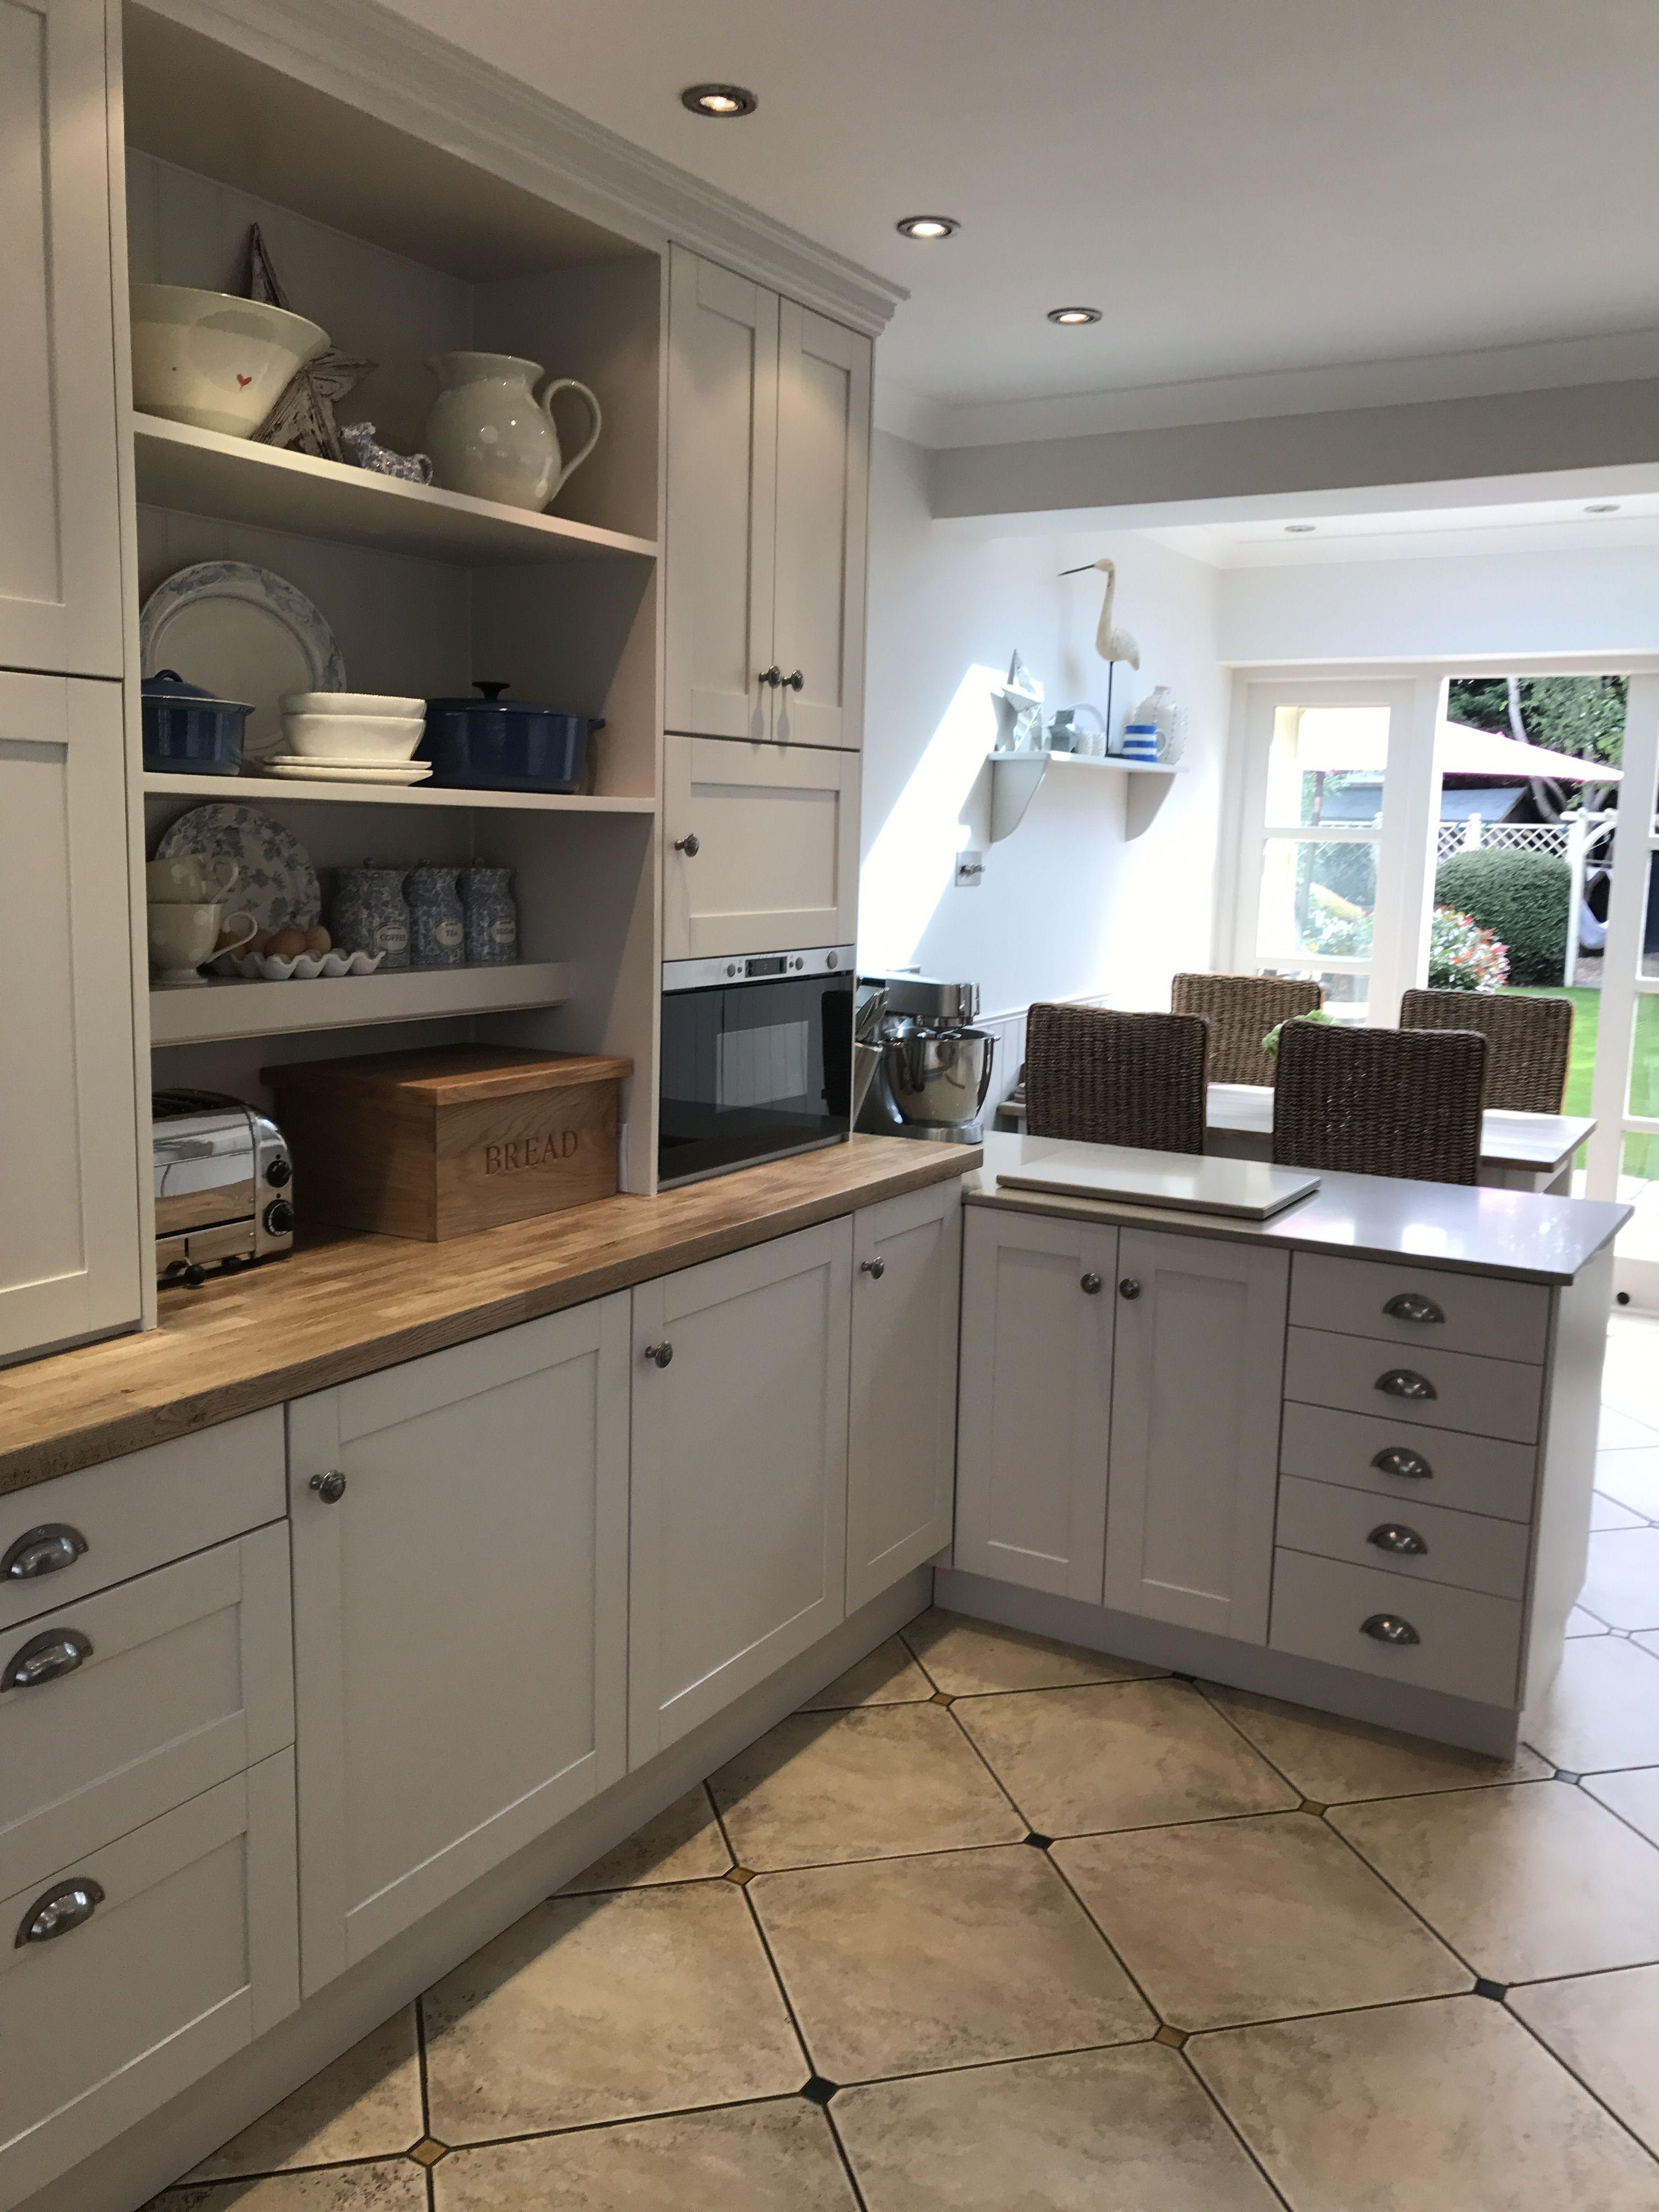 Grey Cabinets With Beige Ceramic Tile Floor Ceramic Tile Floor